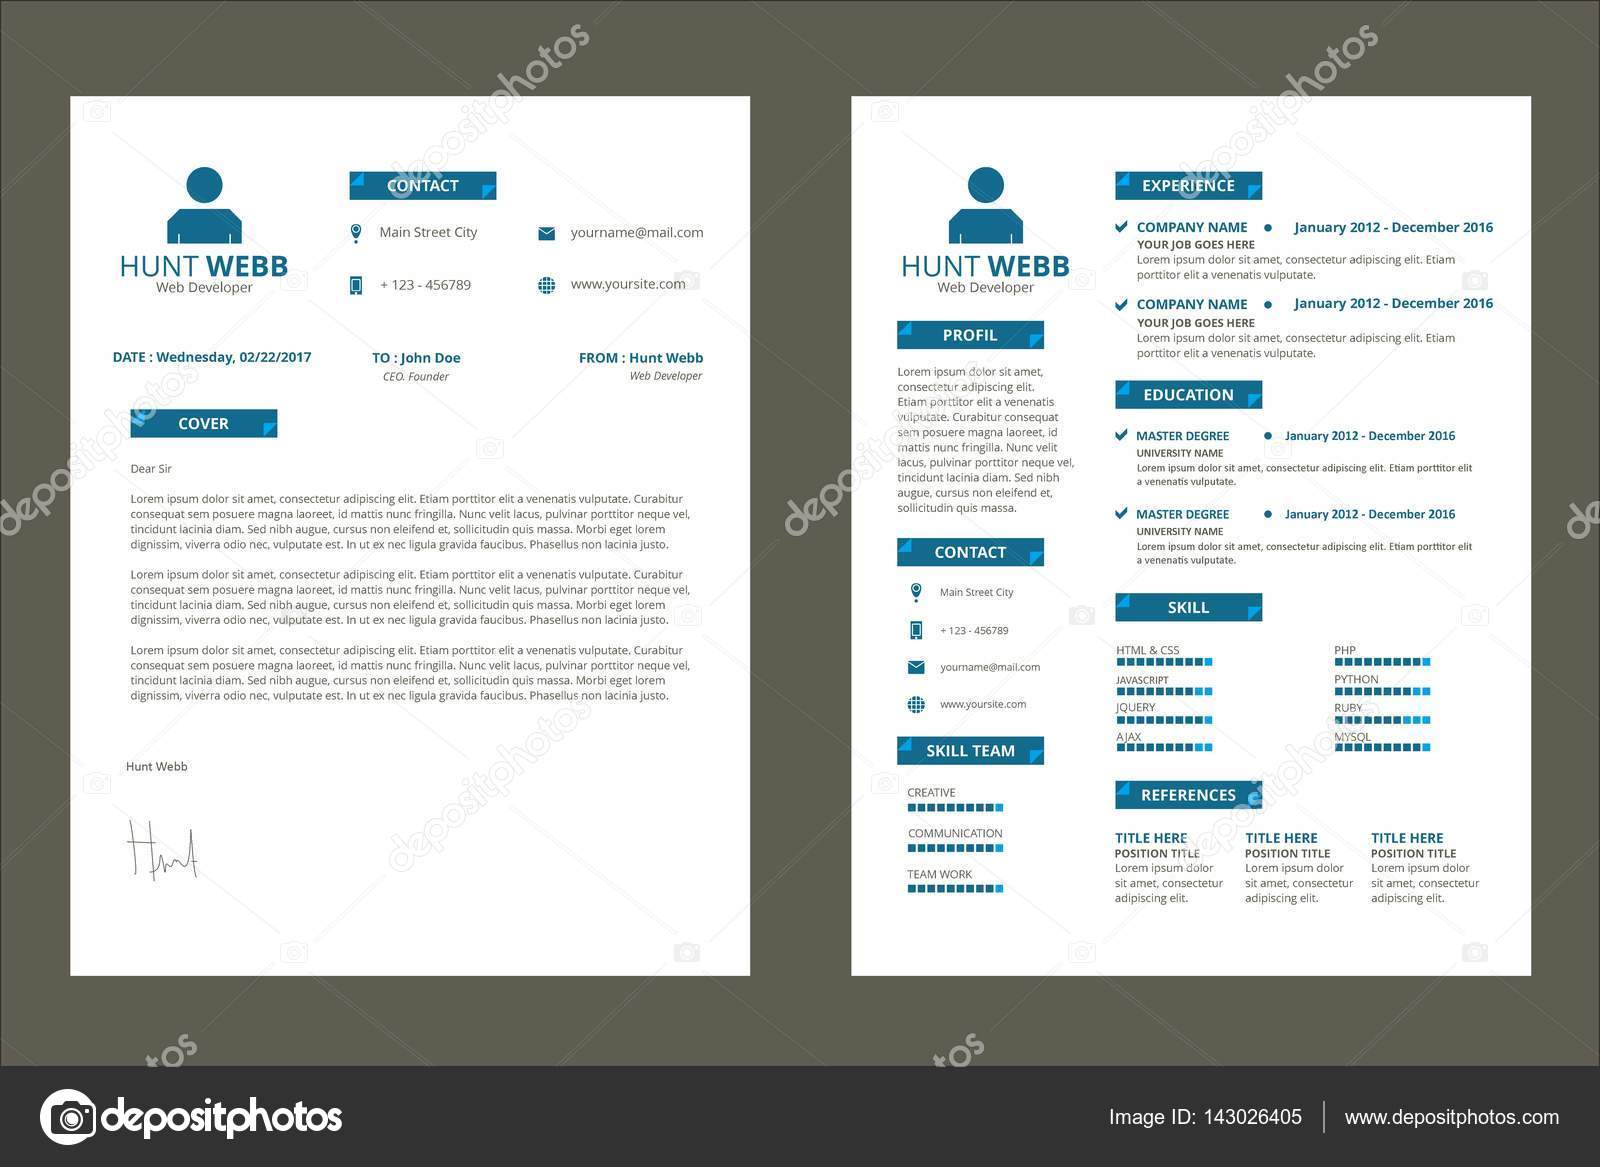 CV Resume, Curriculum Vitae Color Blue \u2014 Stock Vector © hendra